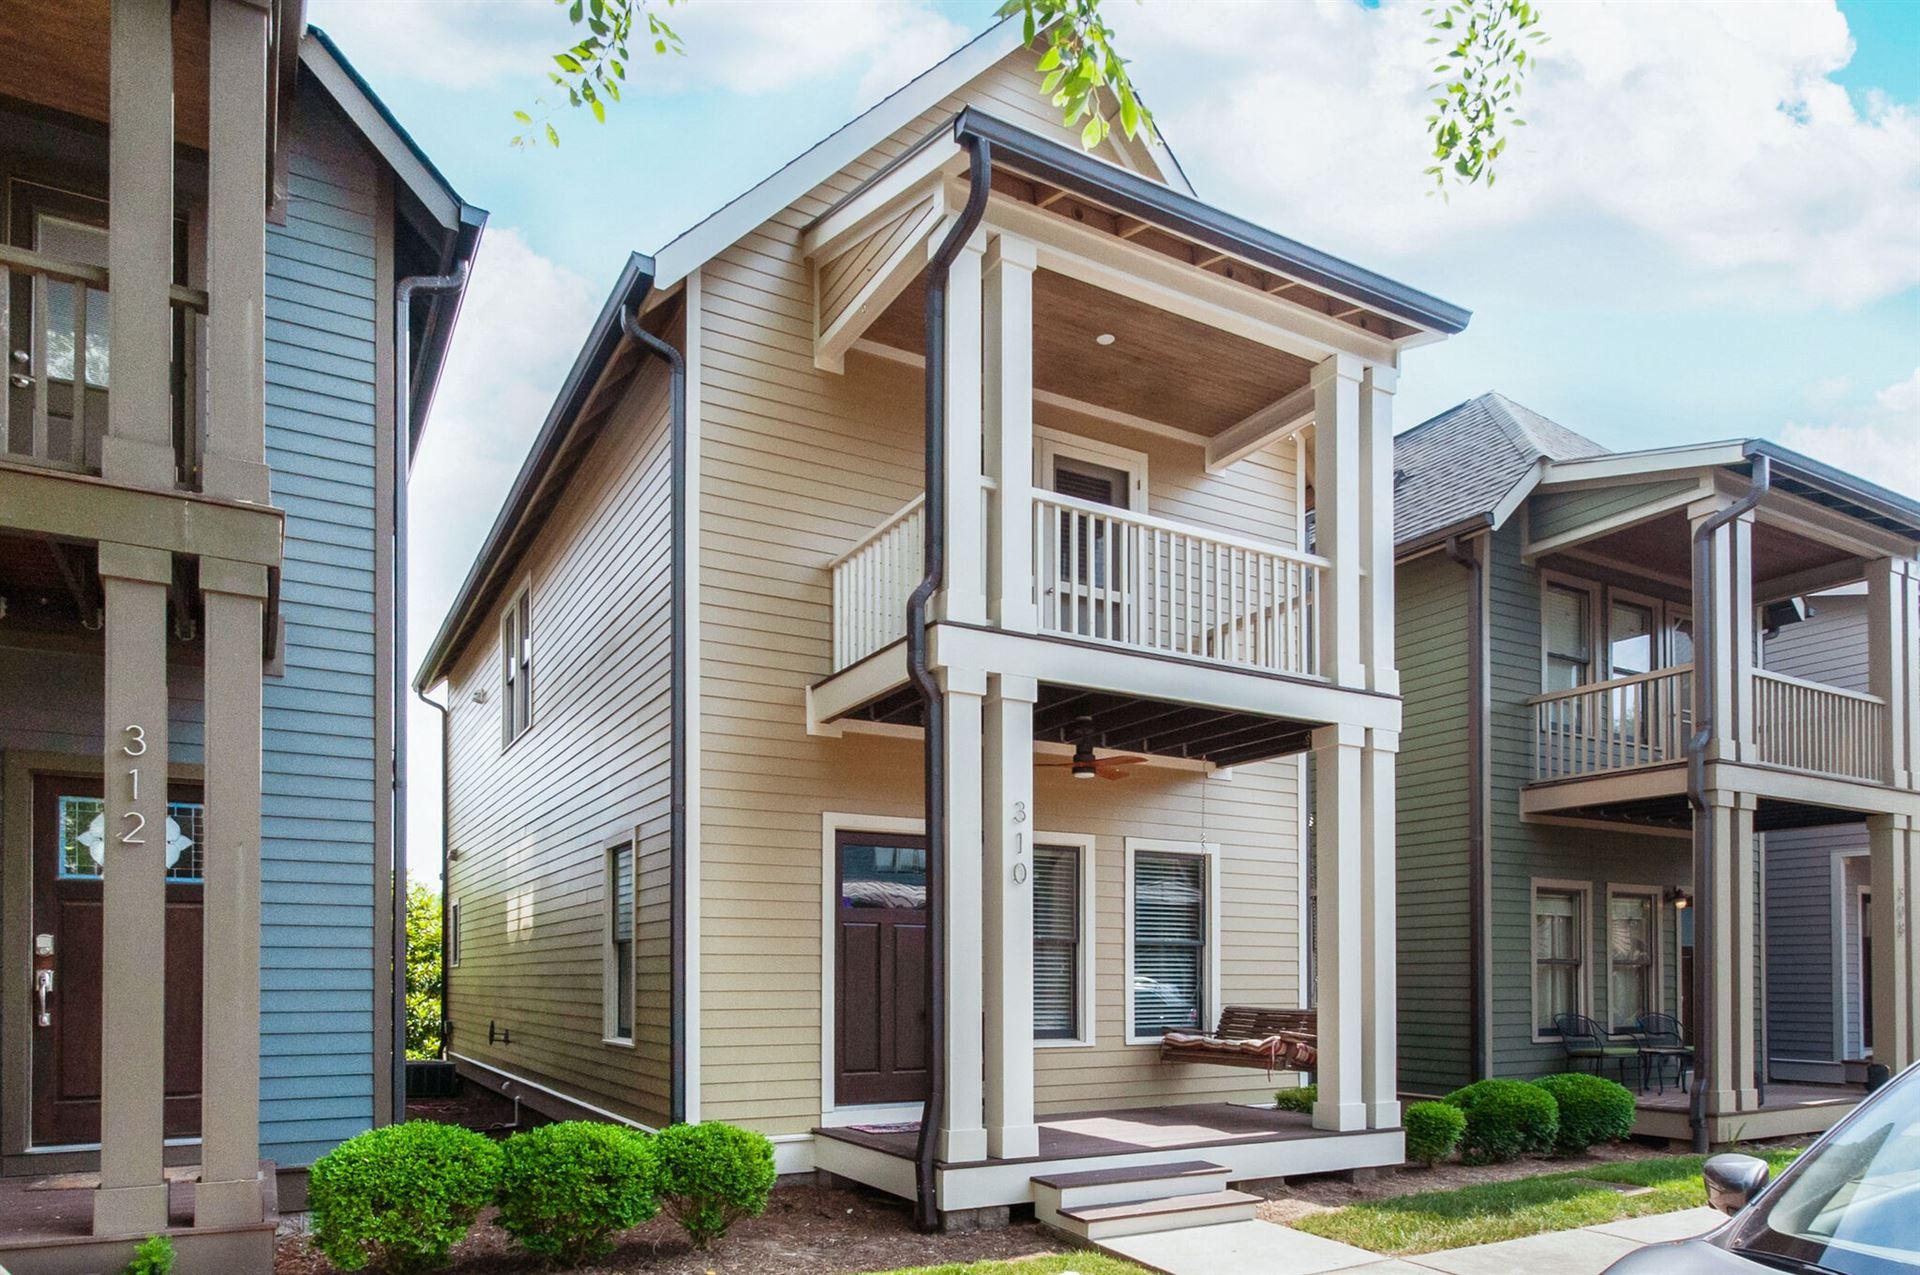 310 Sylvan Park Ln, Nashville, TN 37209 - MLS#: 2263467